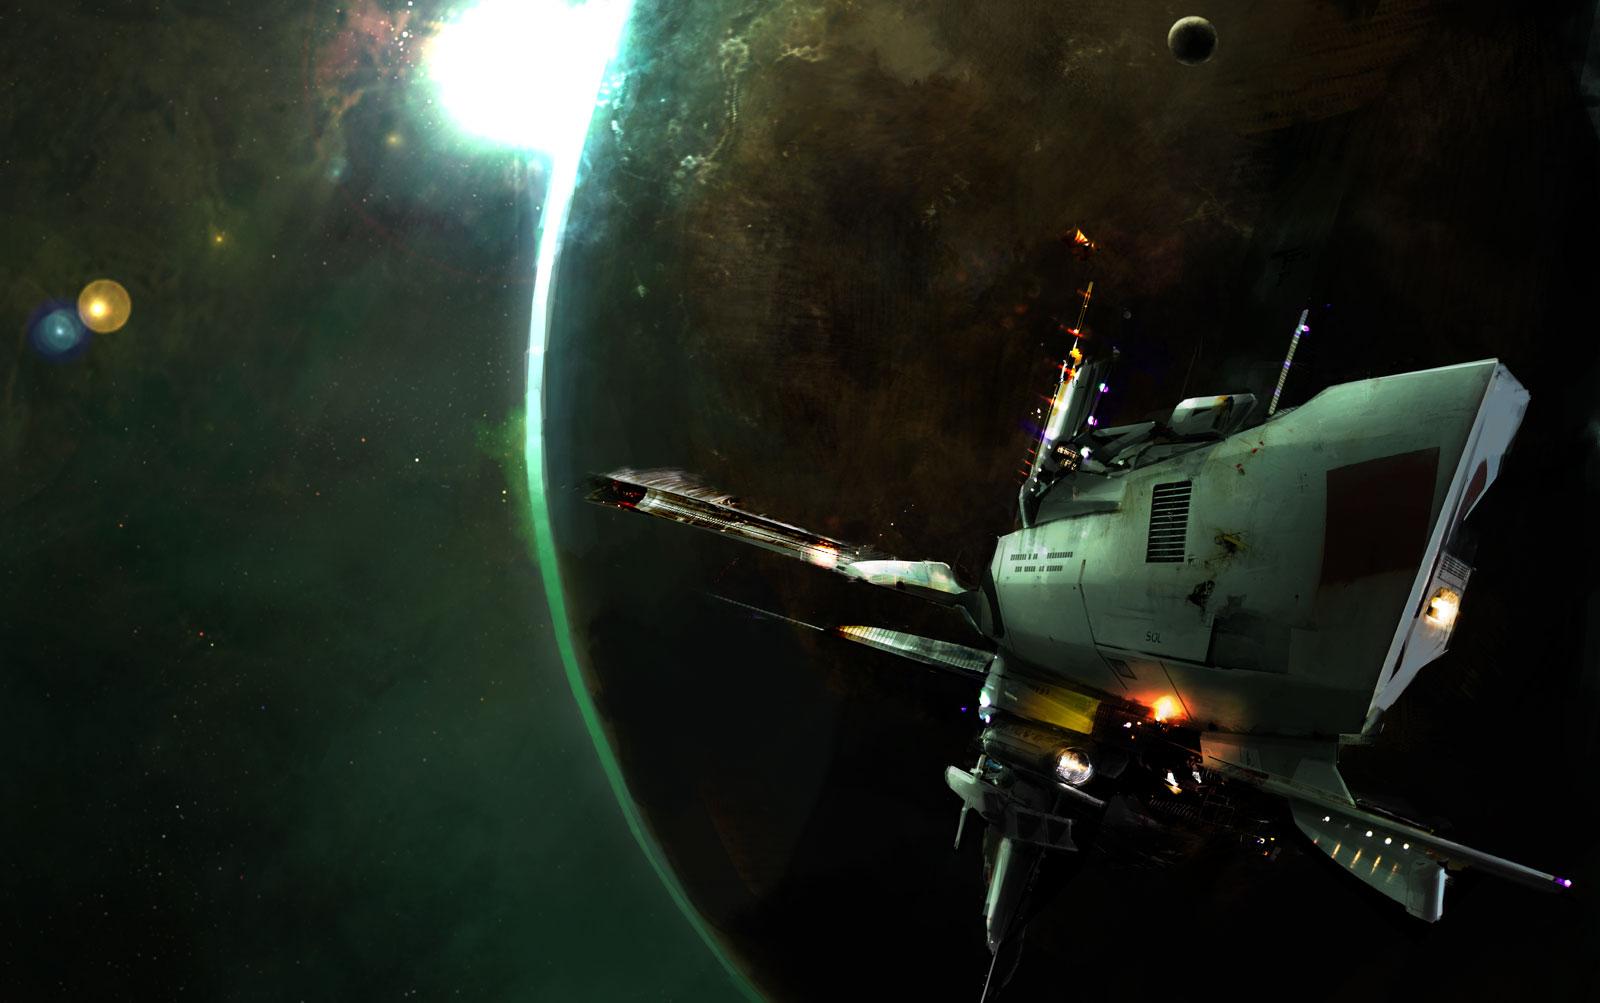 SpaceScene06.jpg